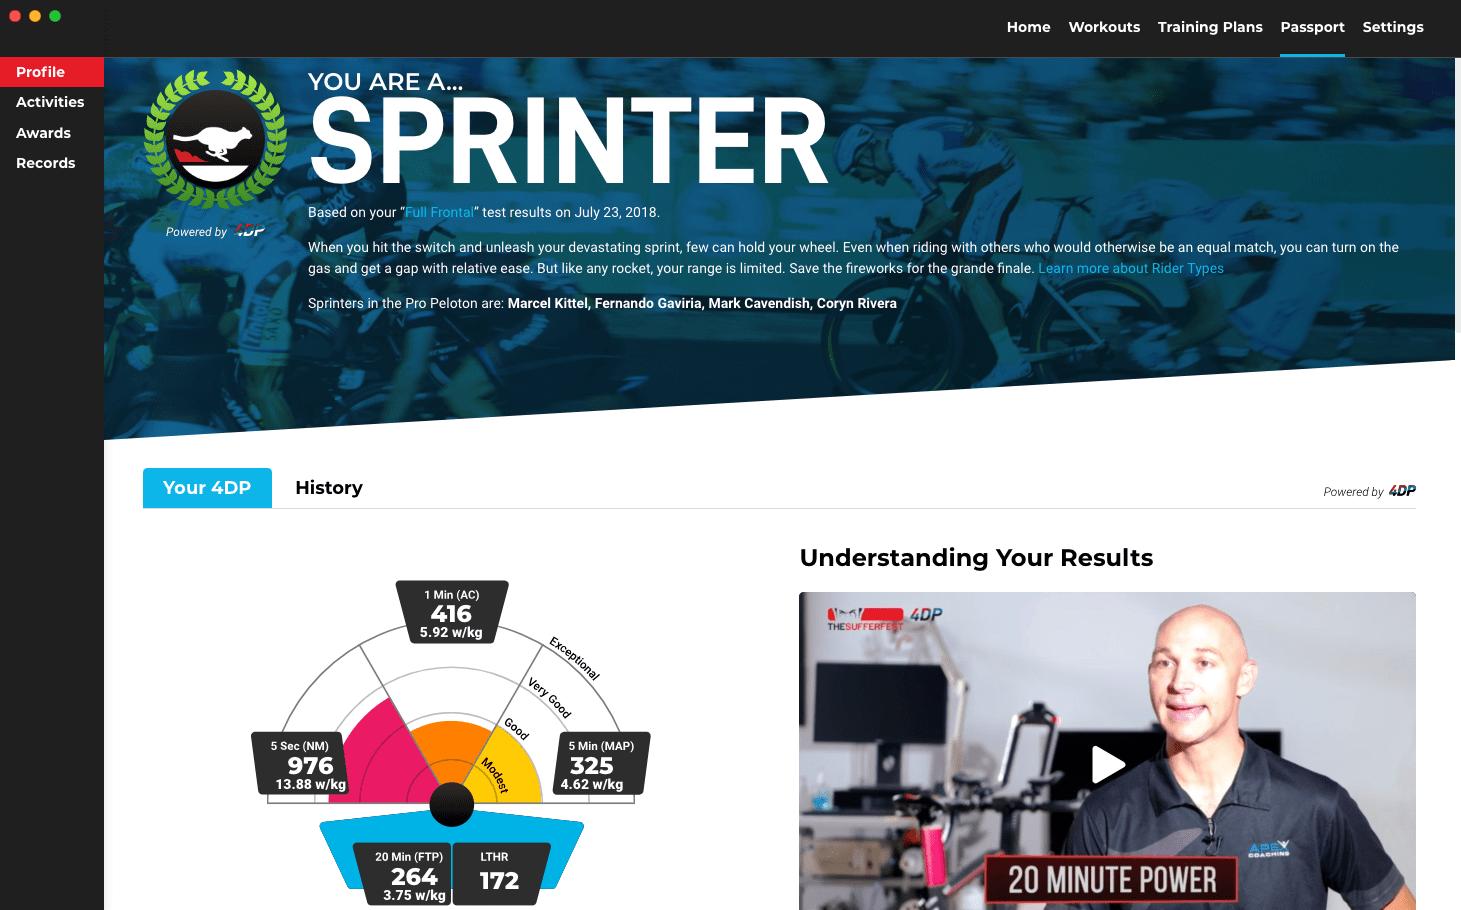 sufferfest, sprinter, profile, passport